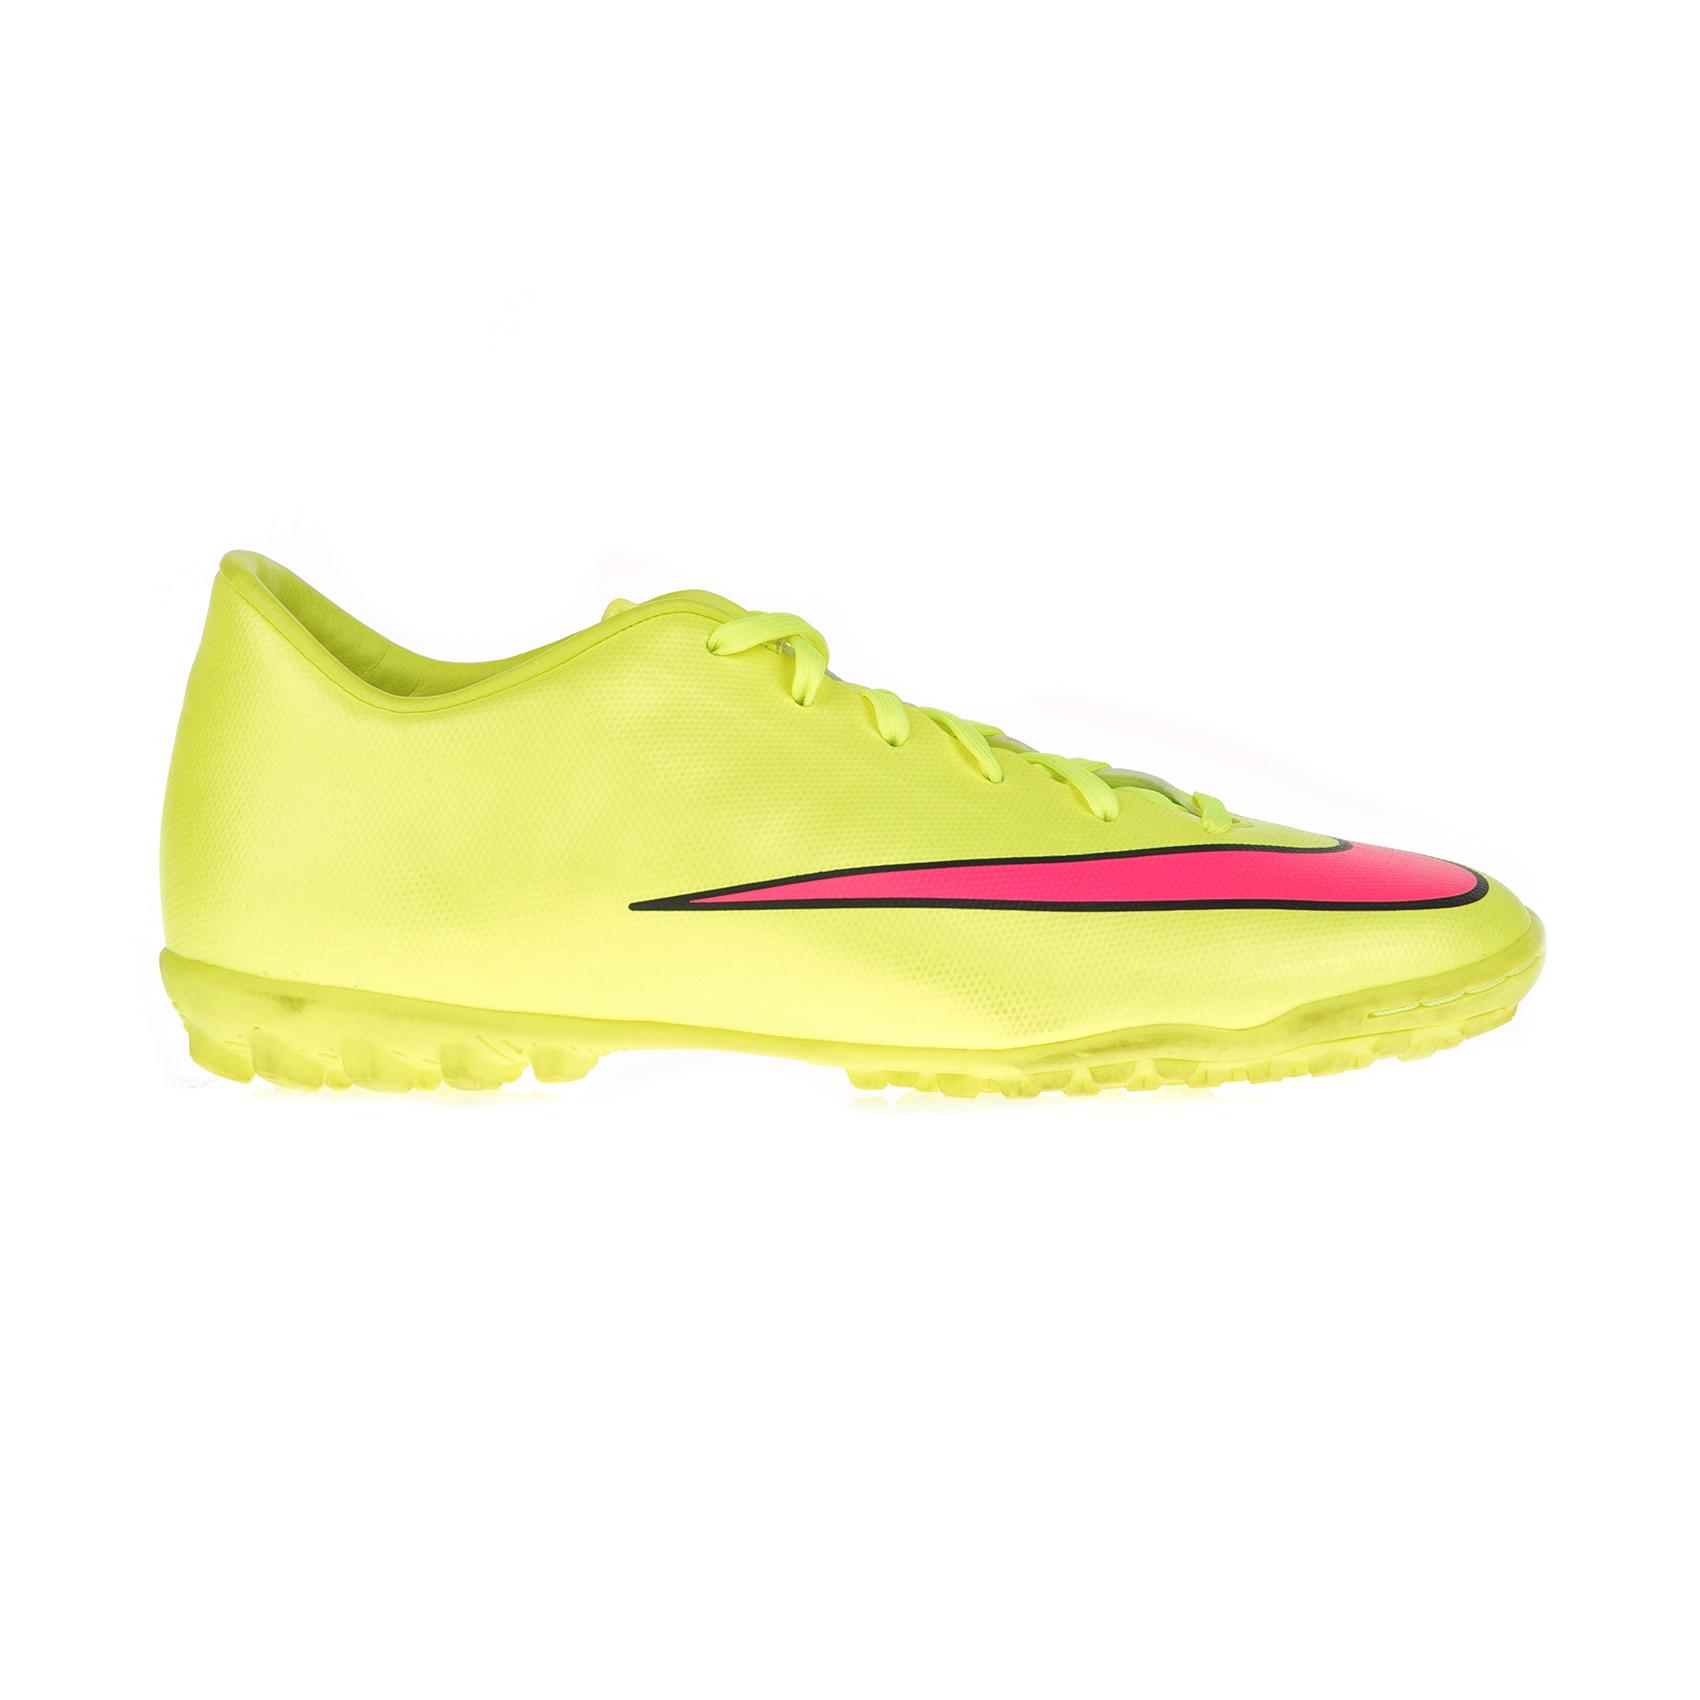 NIKE – Ανδρικά παπούτσια ποδοσφαίρου Nike MERCURIAL VICTORY V TF κίτρινα